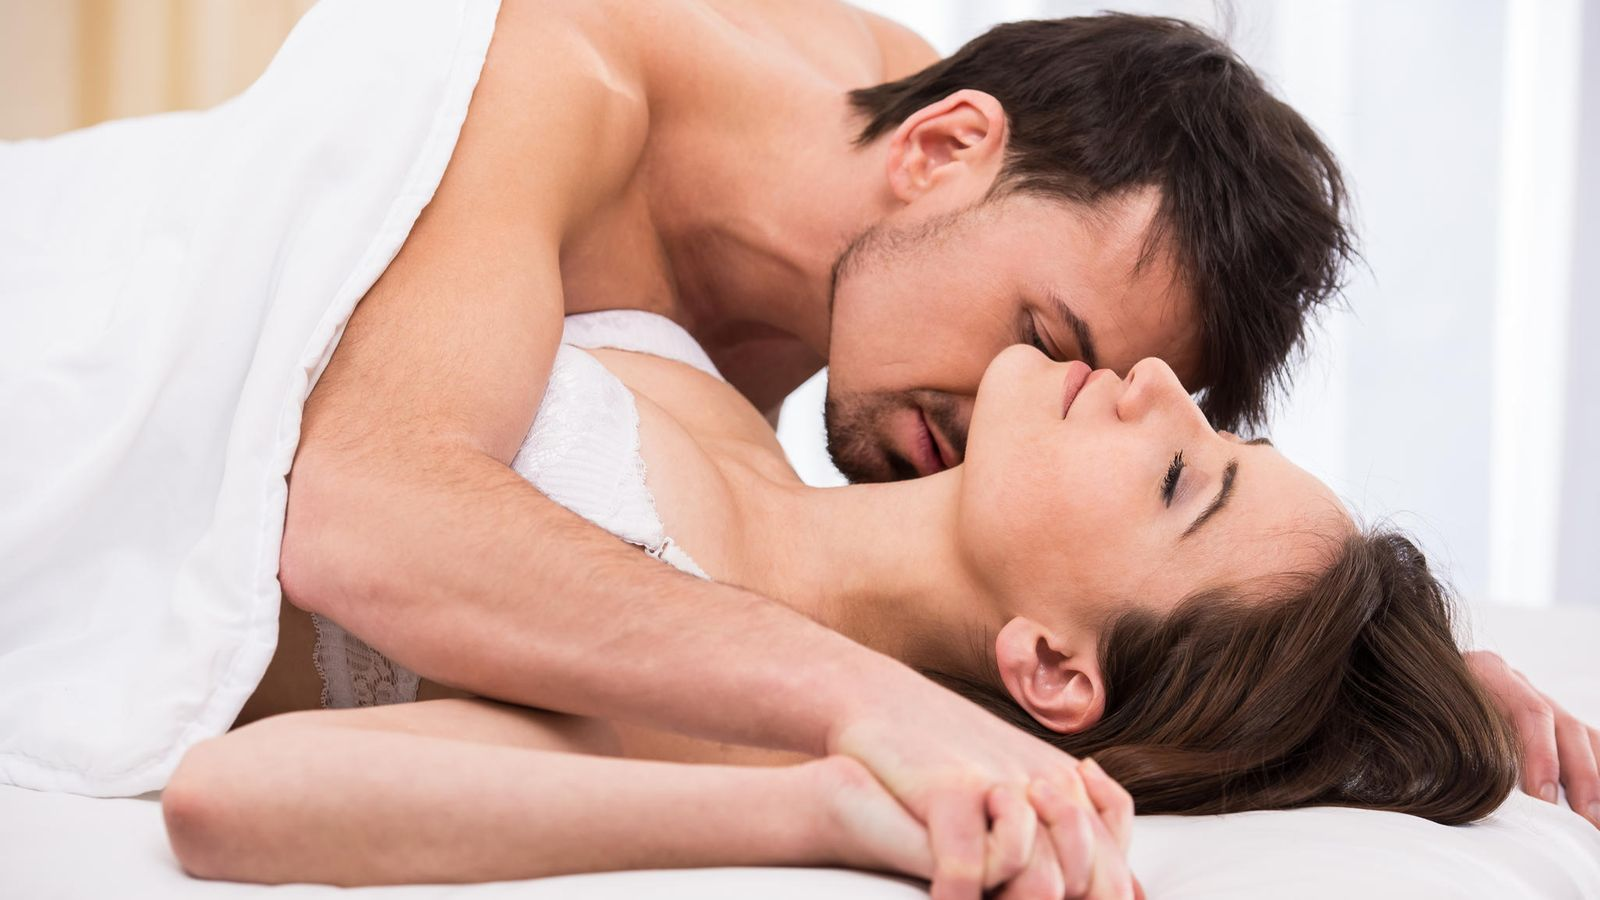 orgasmi videot seksi bitch